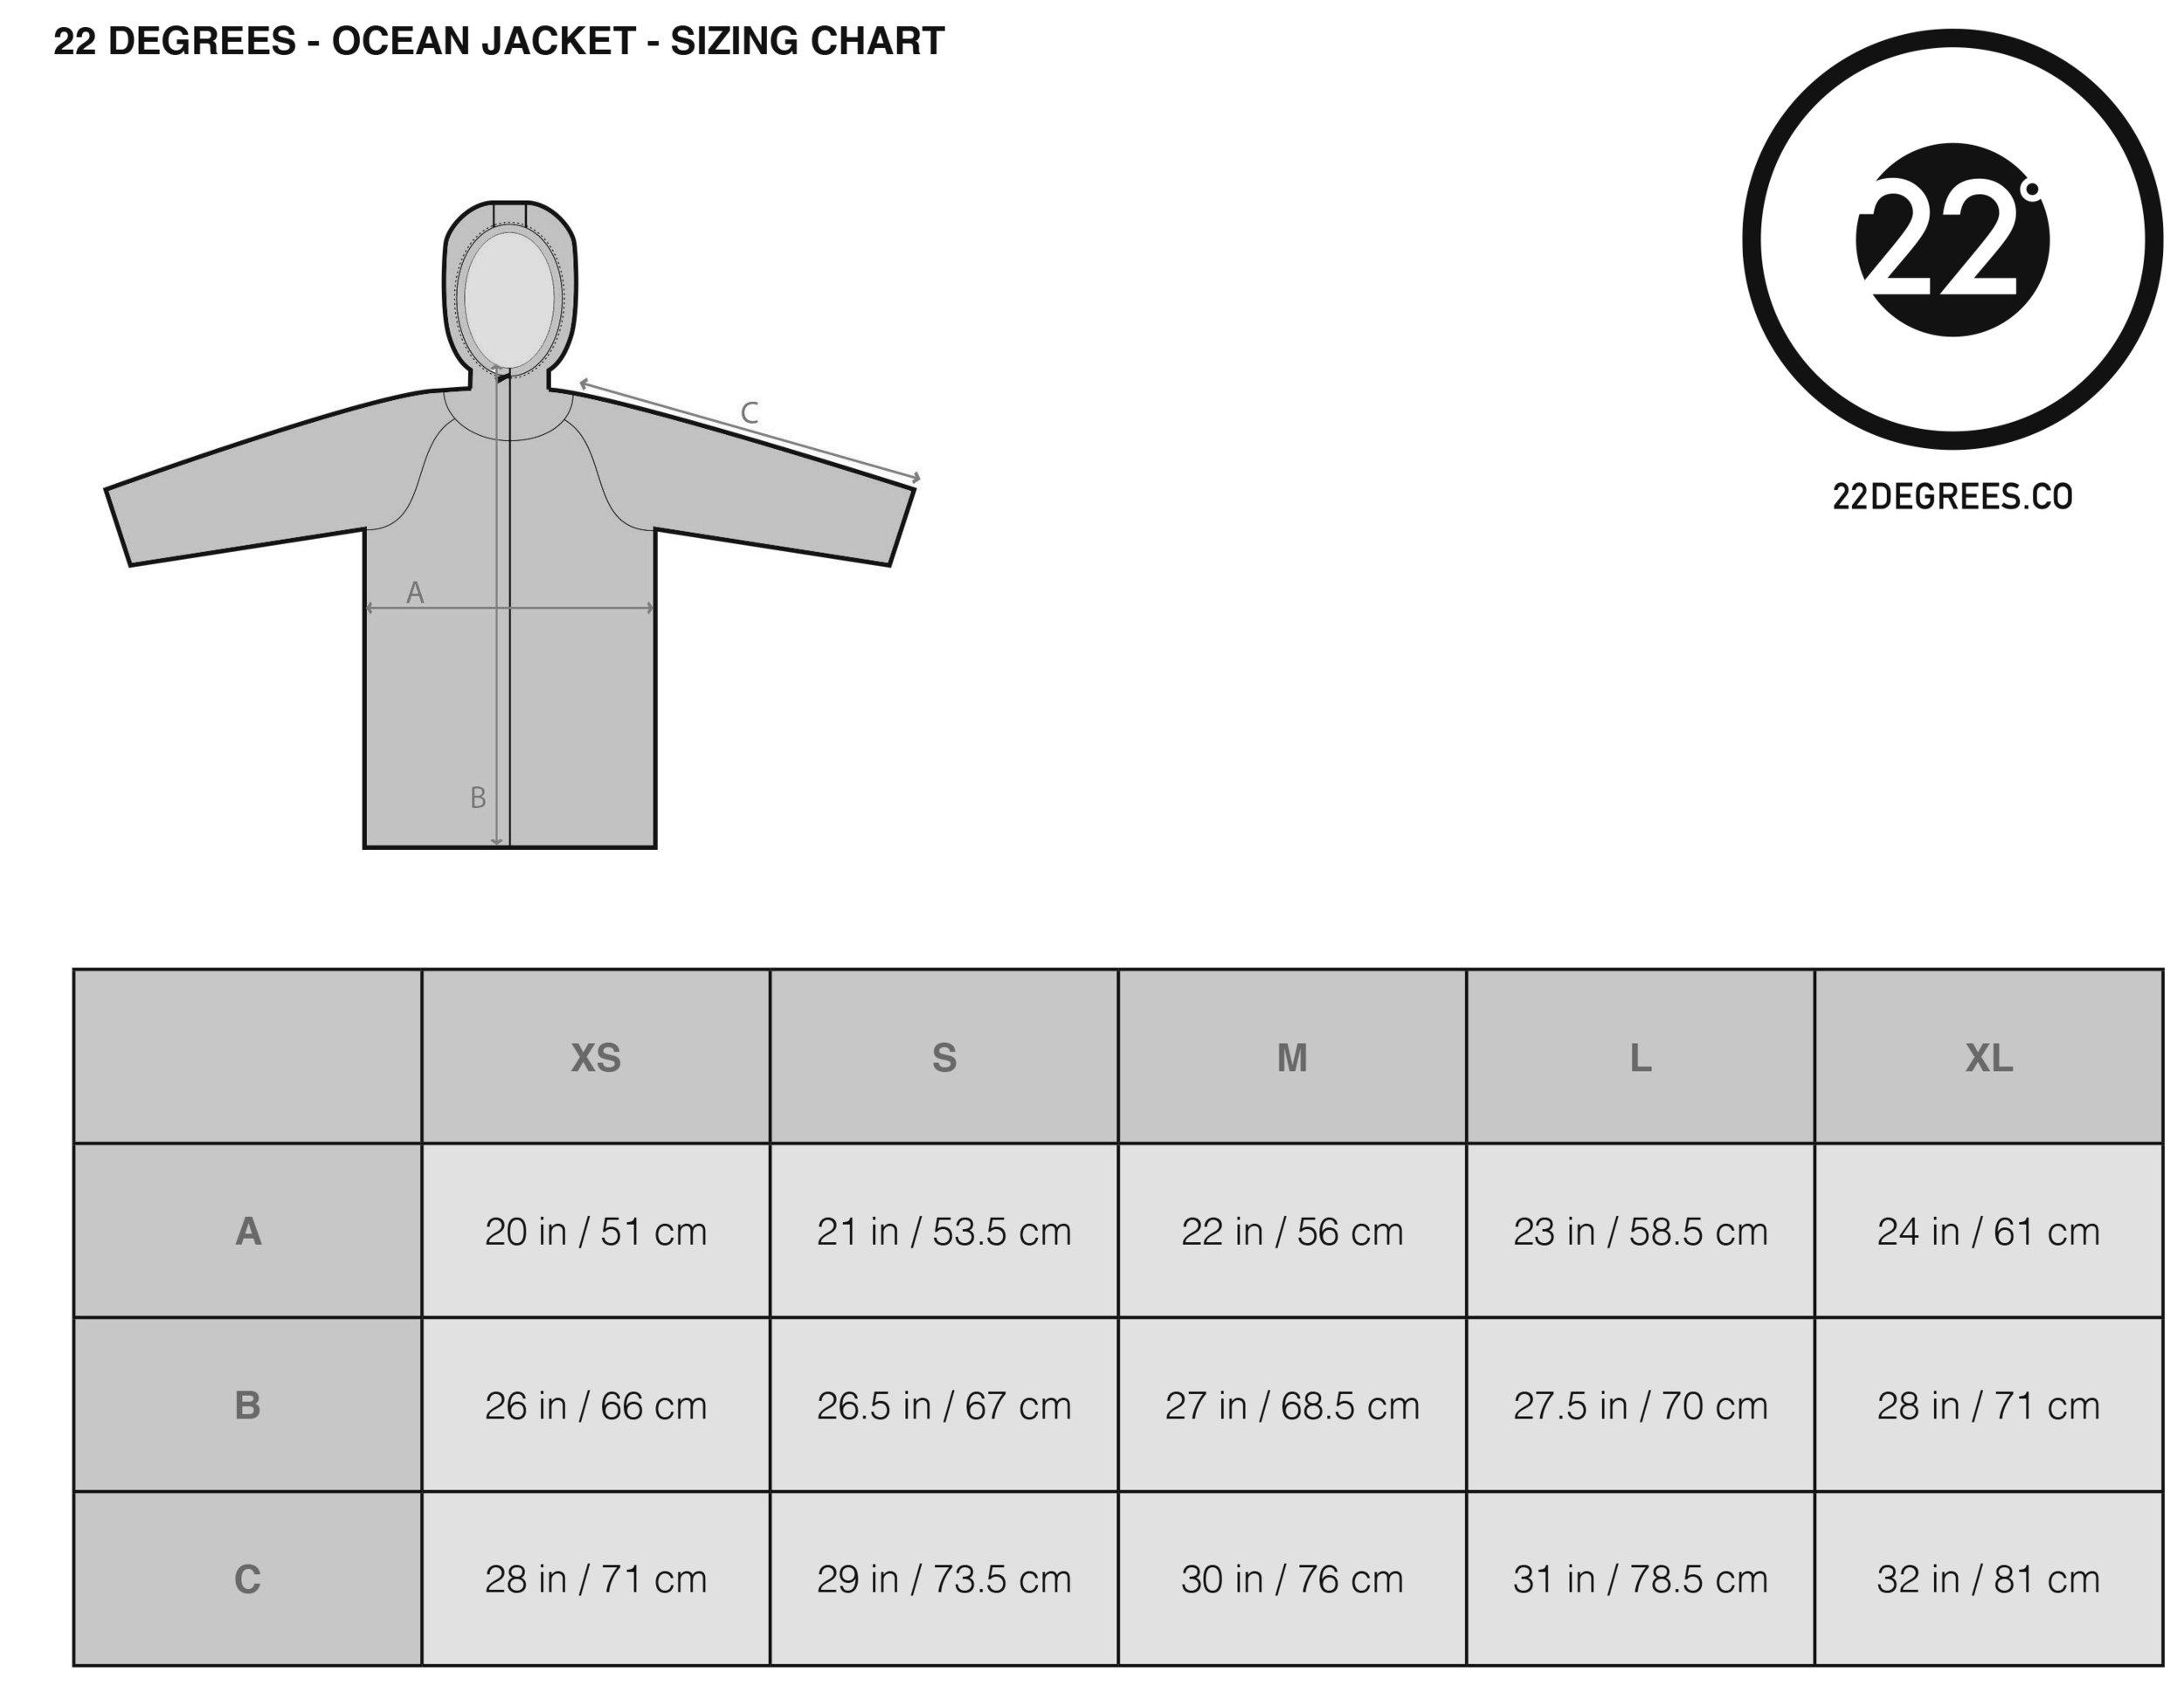 22 DEGREES Jacket Size Chart.jpg